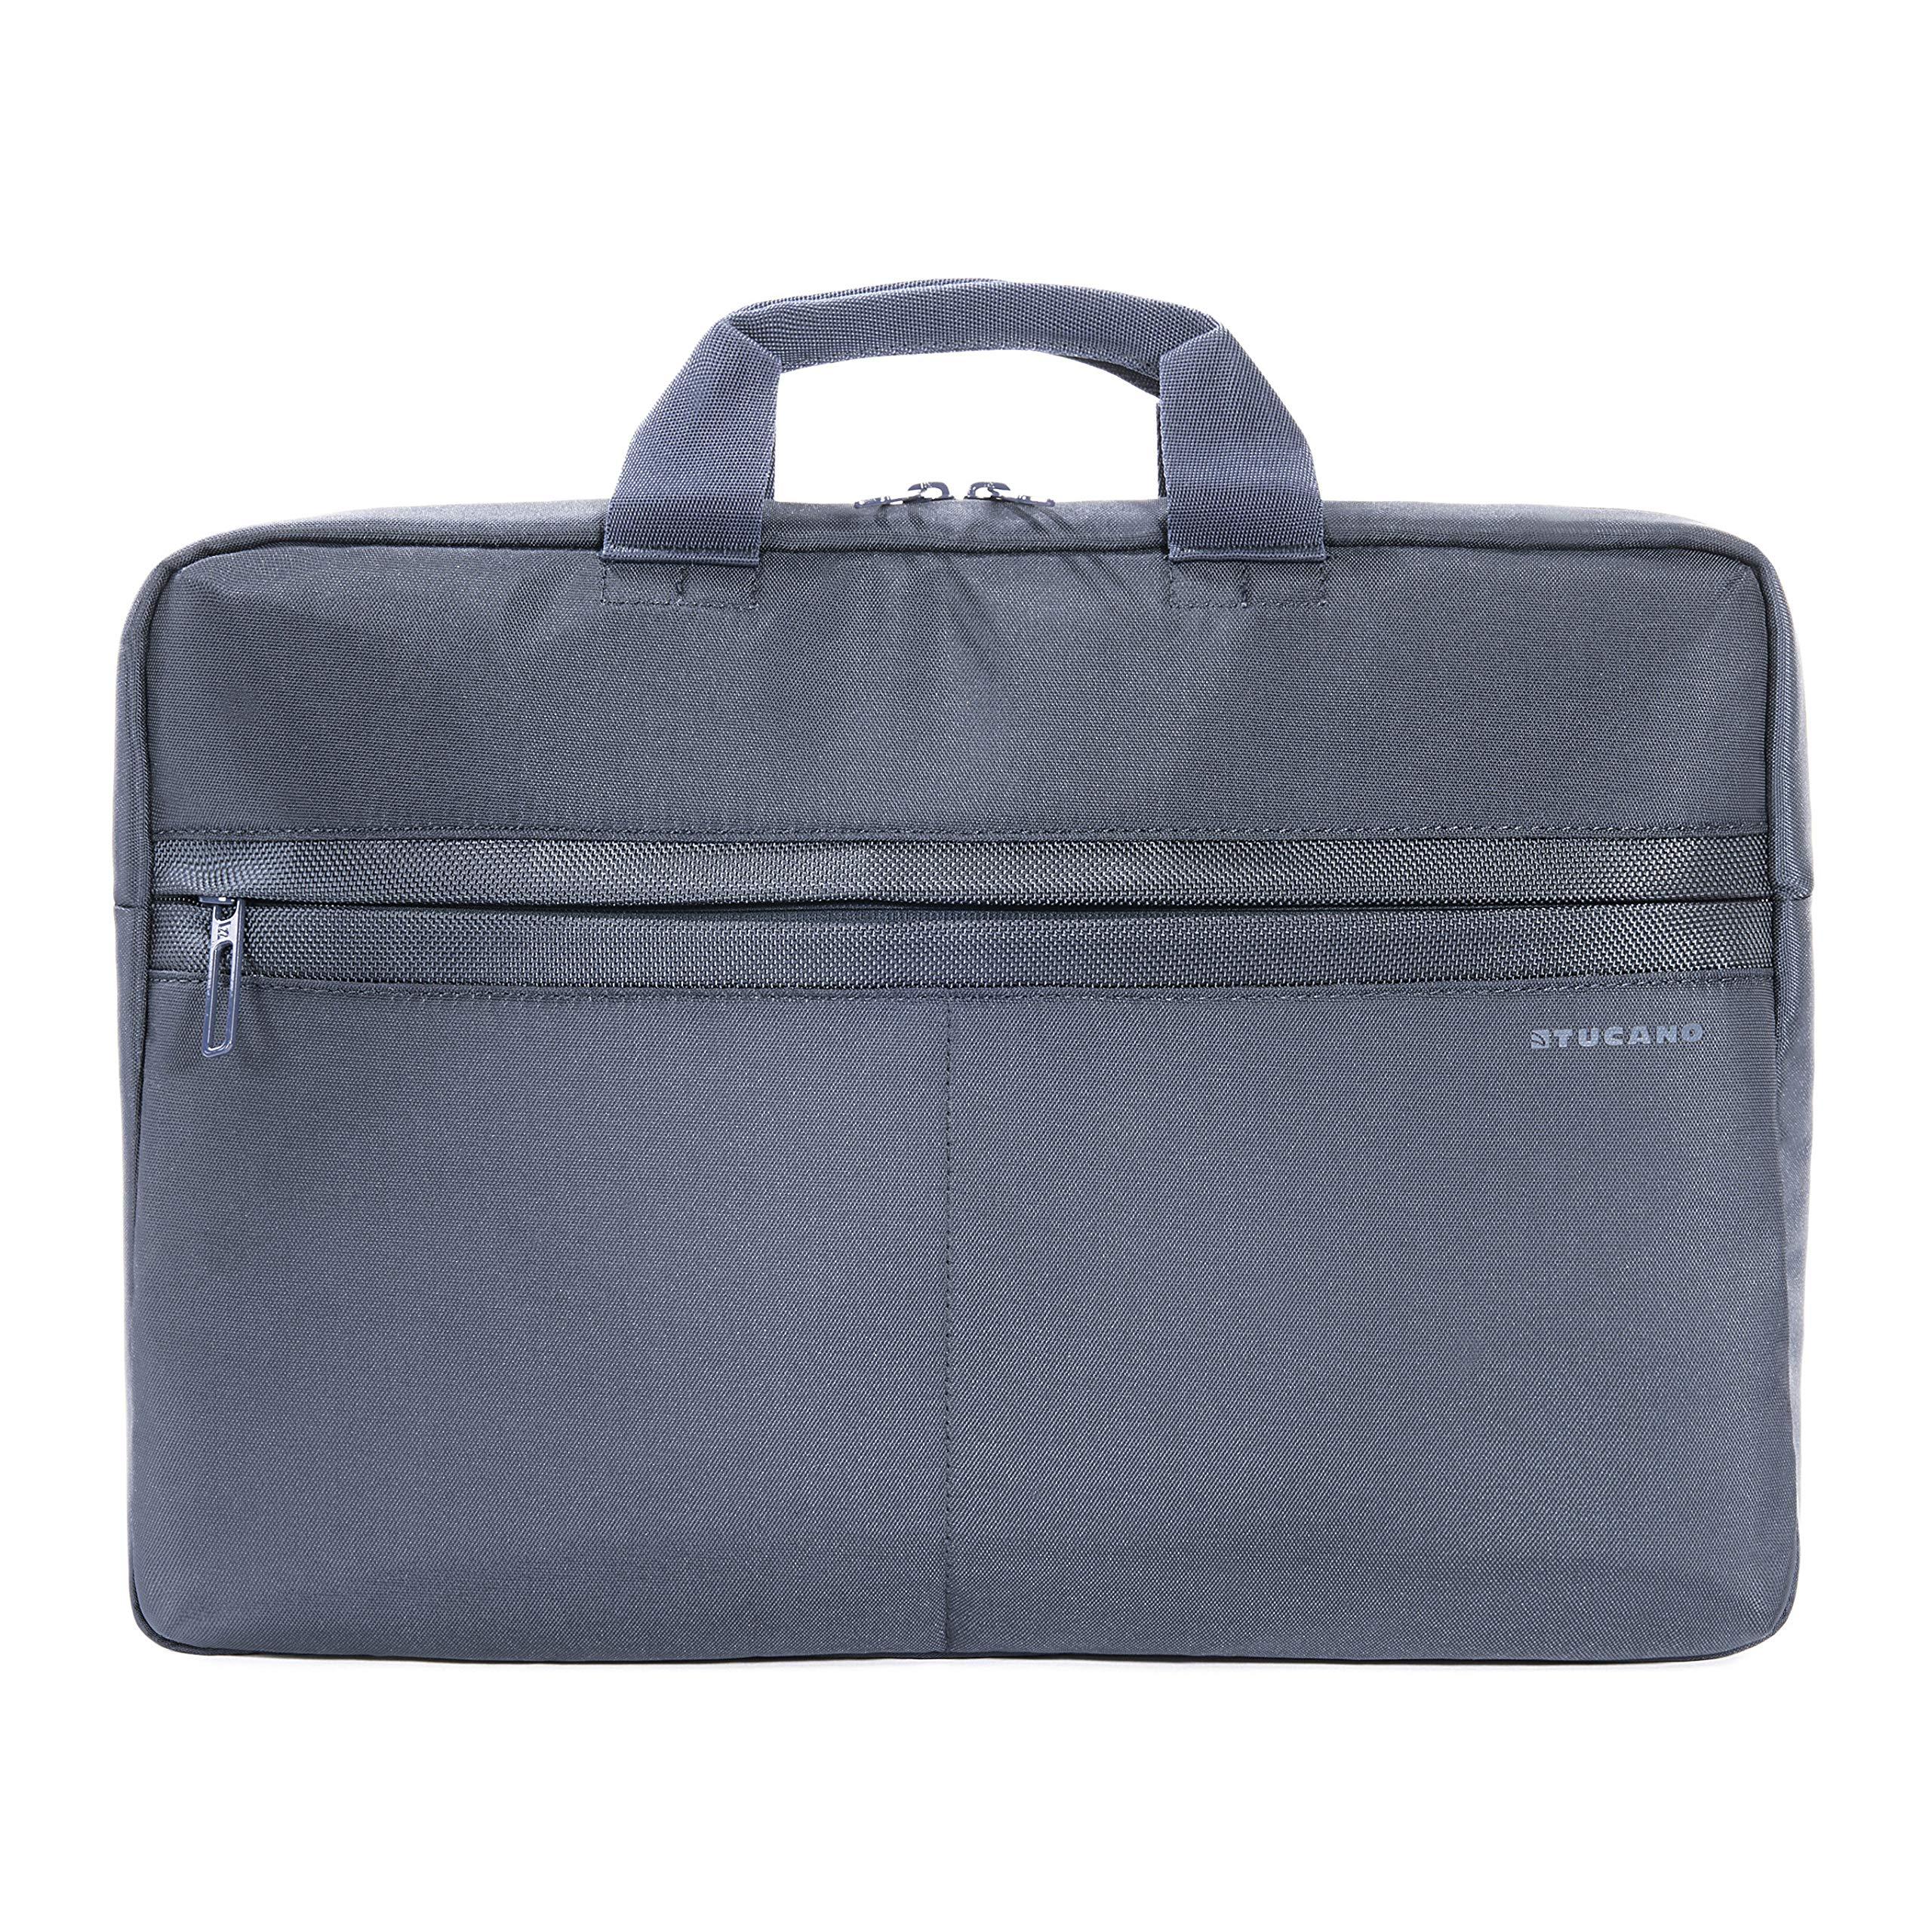 Tucano BTRA1314-B Laptop Computer Bags & Cases